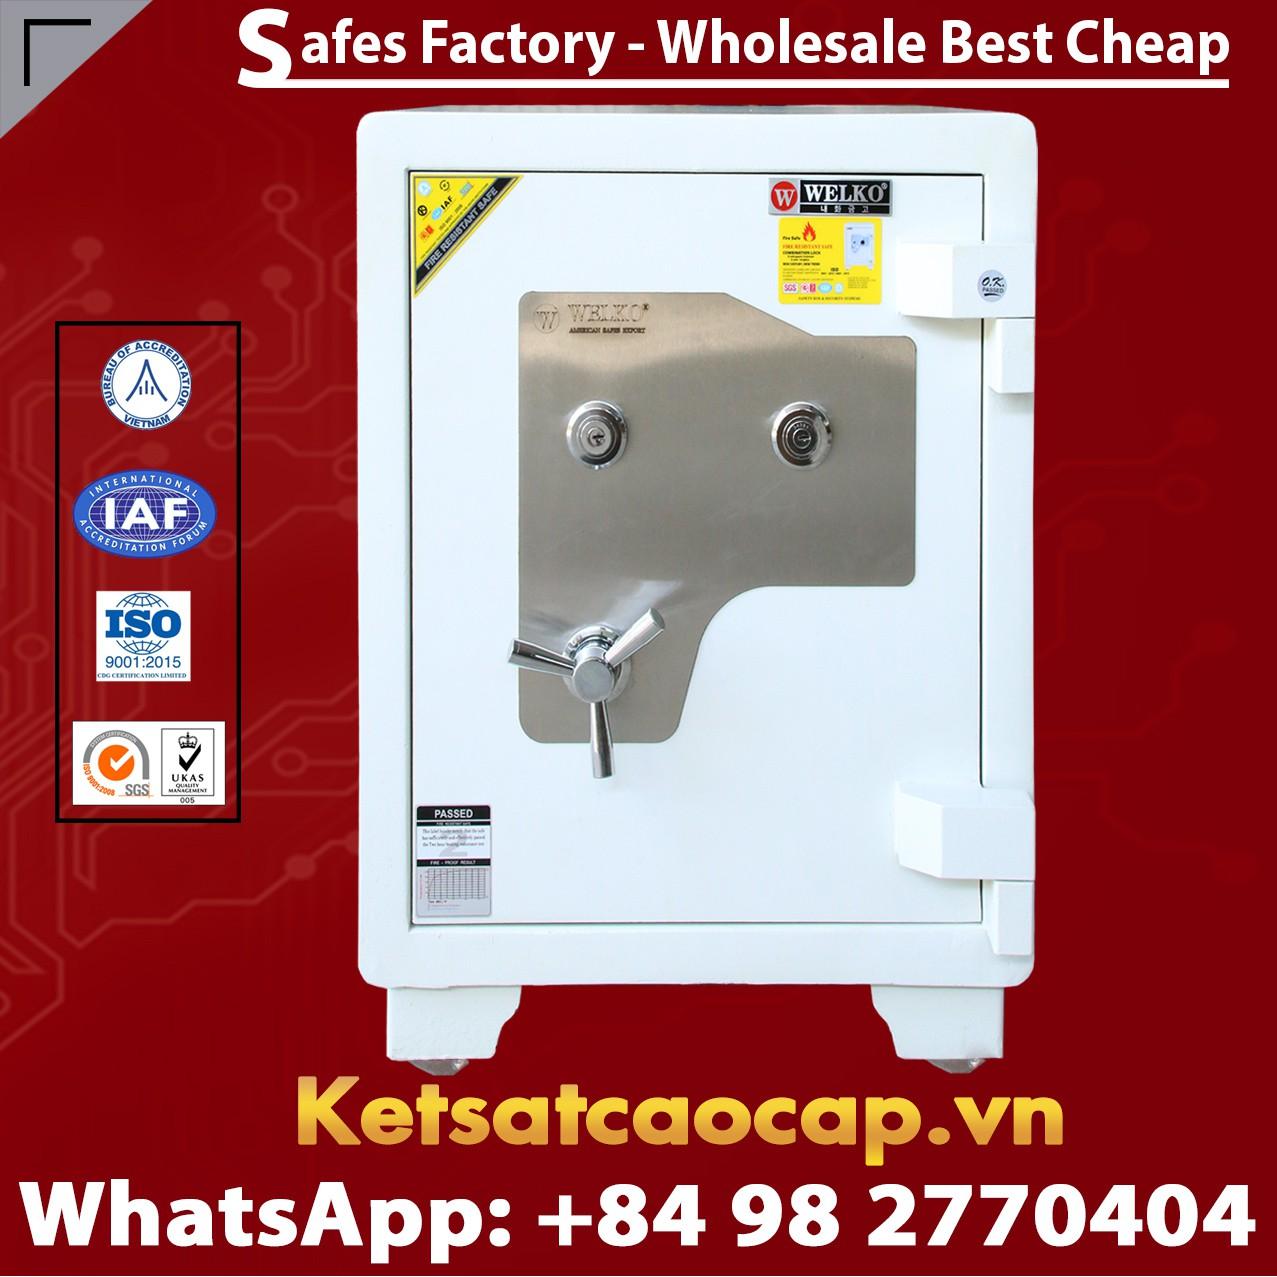 Safes Box Company WELKO US680 KEY